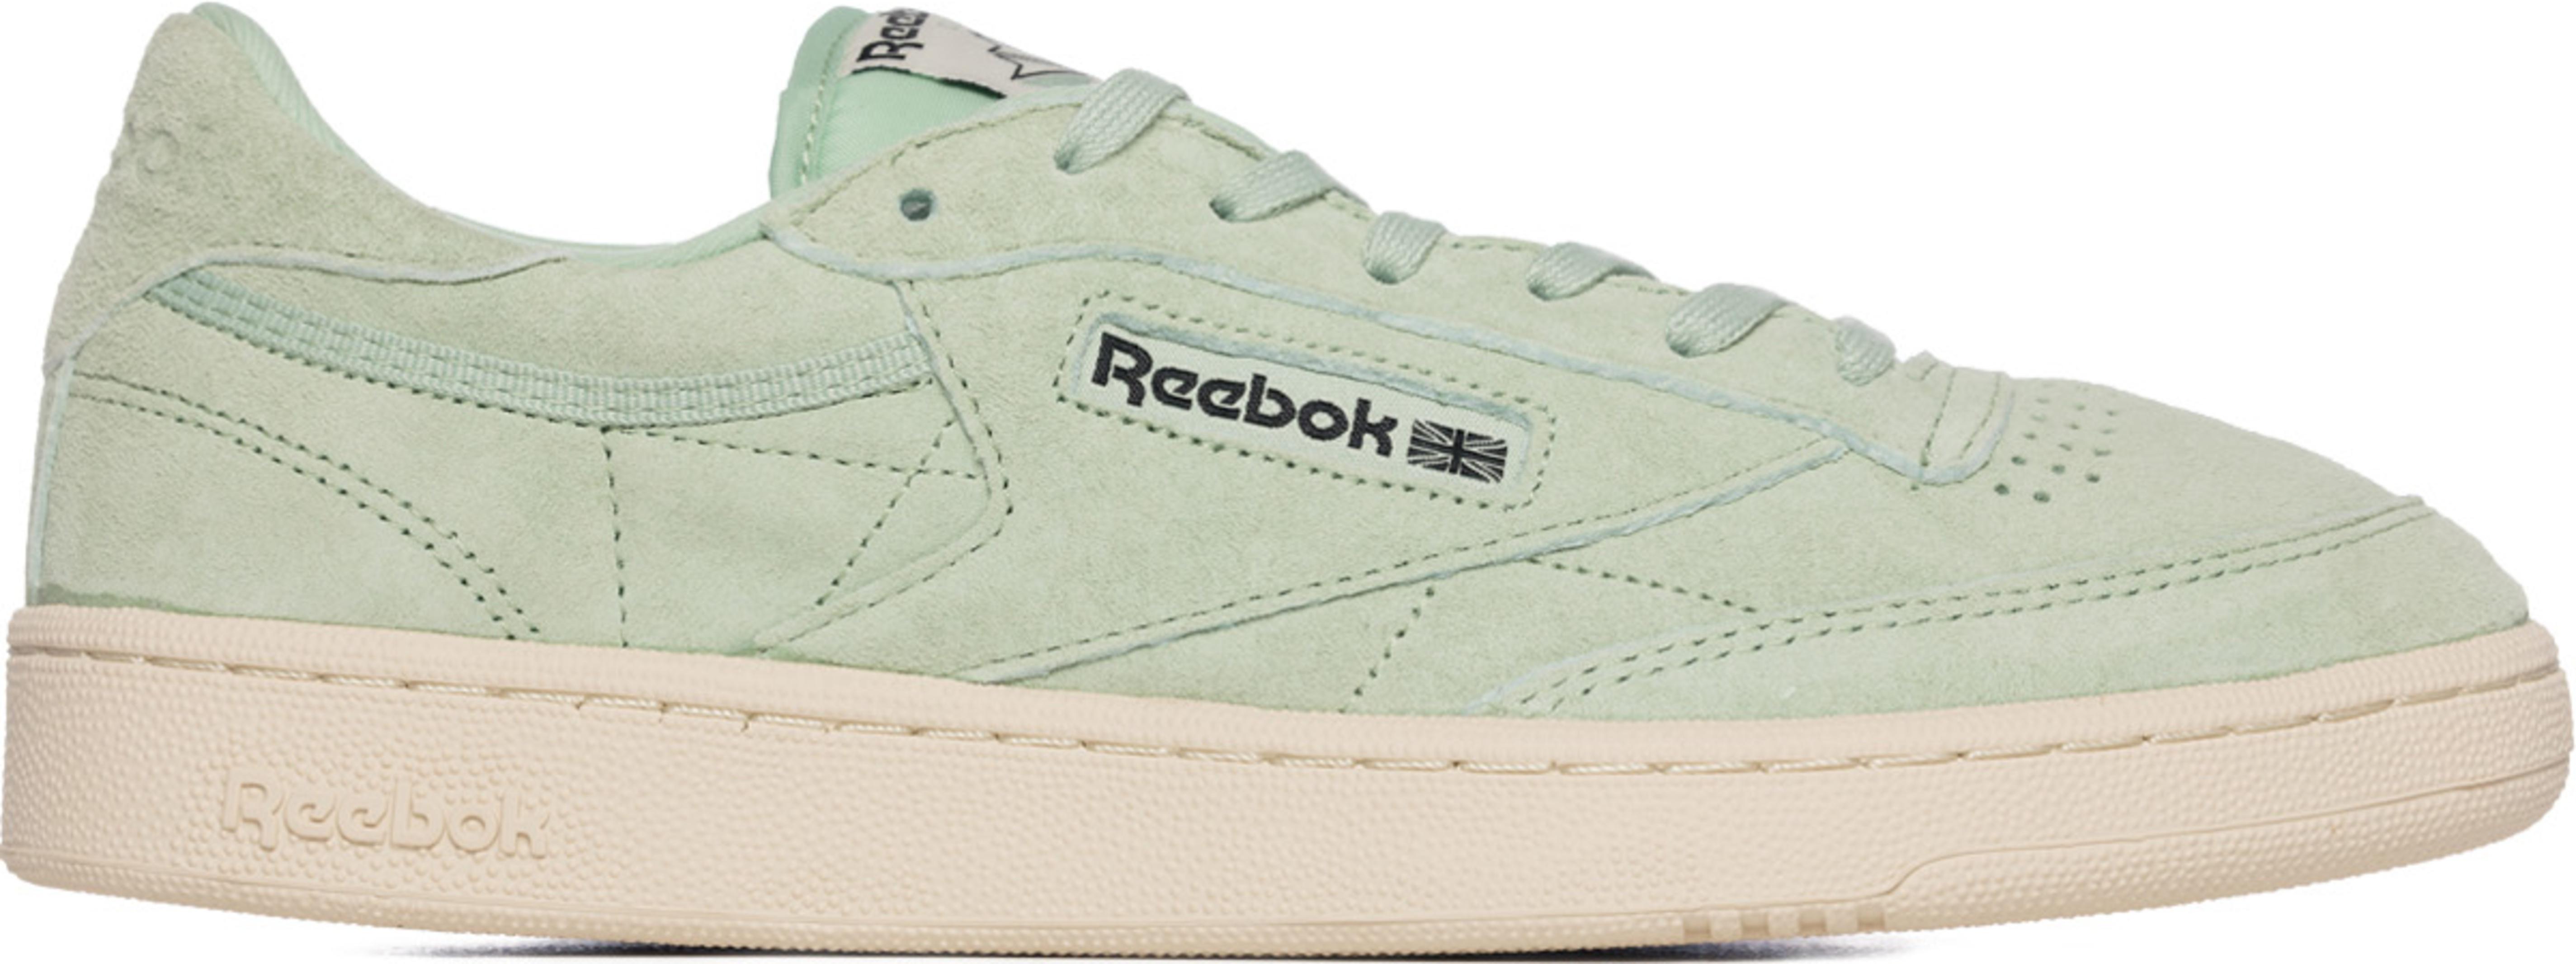 hot sale online 120bb 4160f Reebok - Reebok Club C85 Pastels - Sage Mist/Paper White